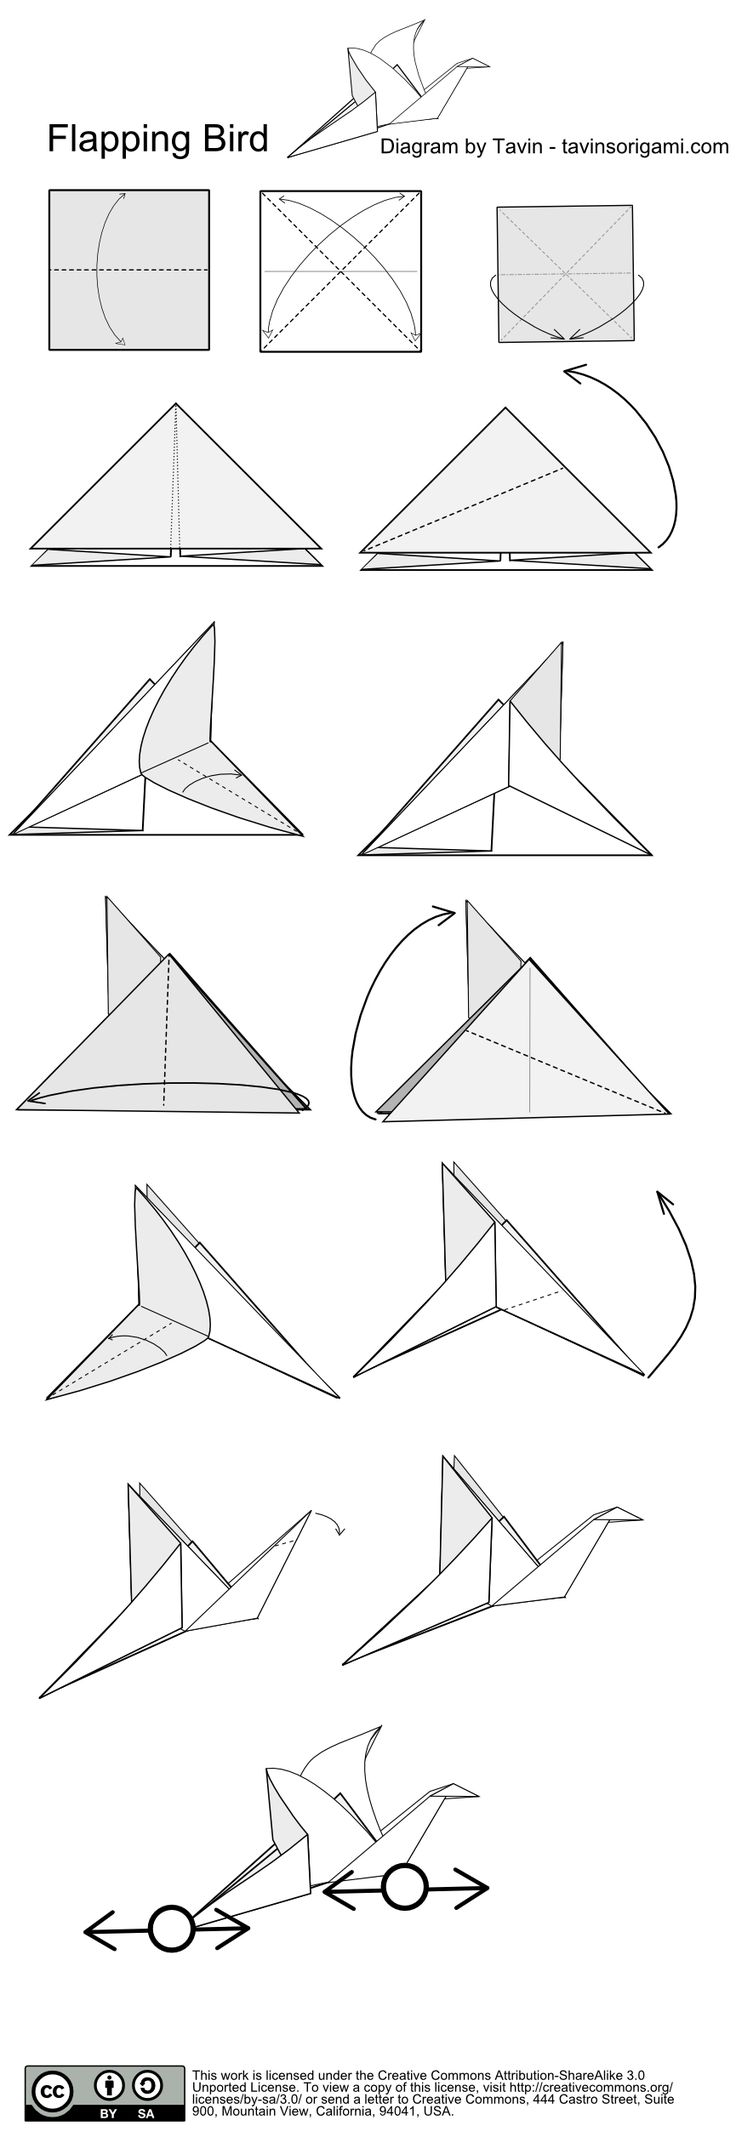 Flapping Bird Origami-Instructions - Tavin's Origami